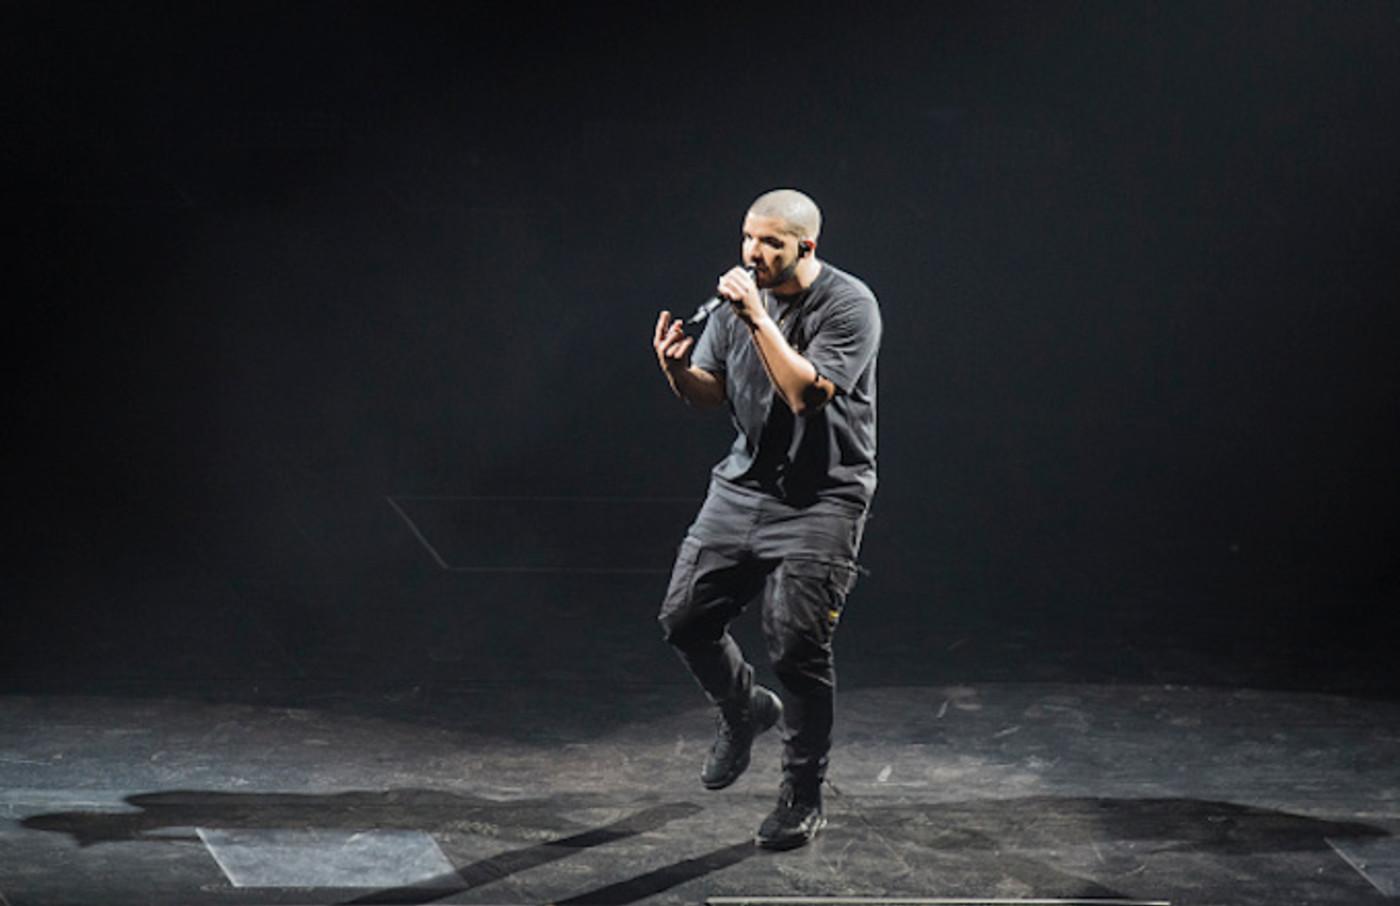 Drake performs at First Direct Arena